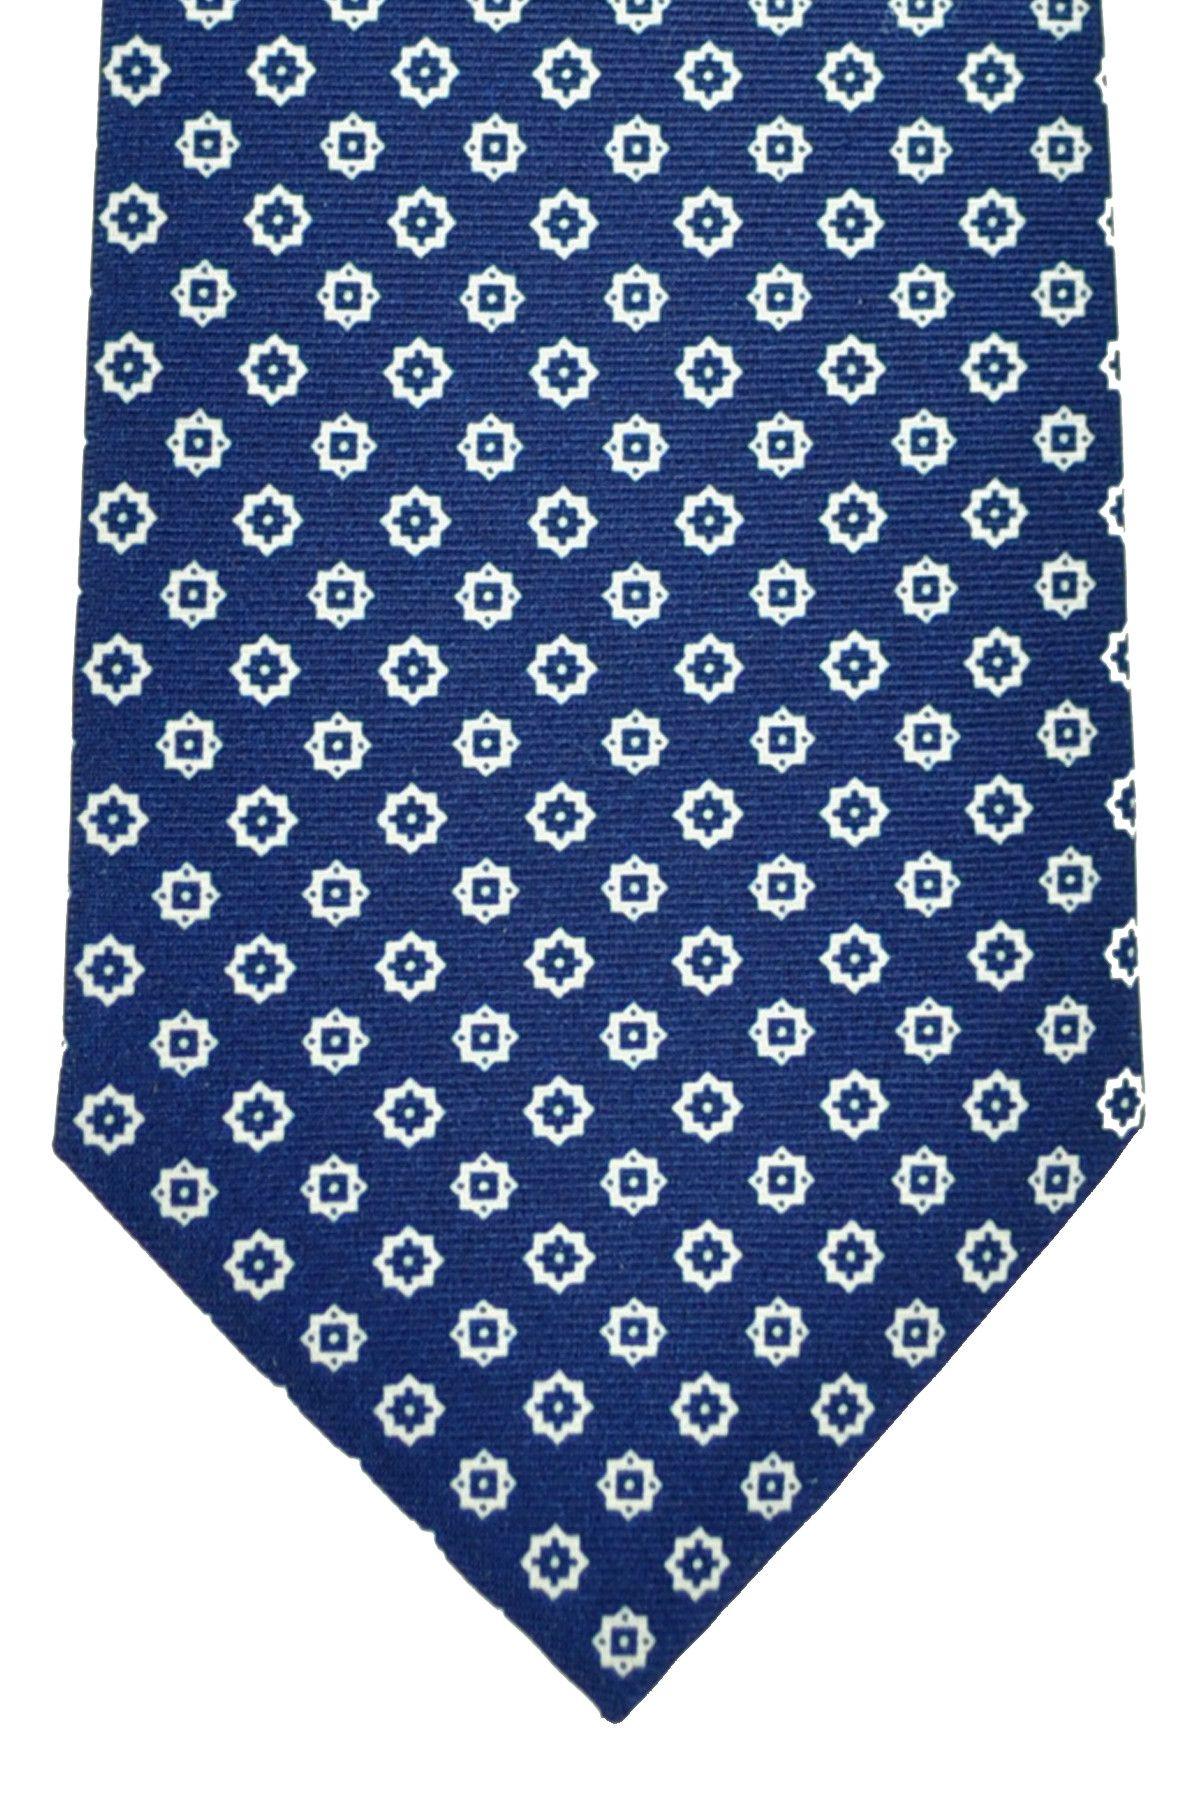 Silk tie navy patterned Borrelli Napoli v2vuU8